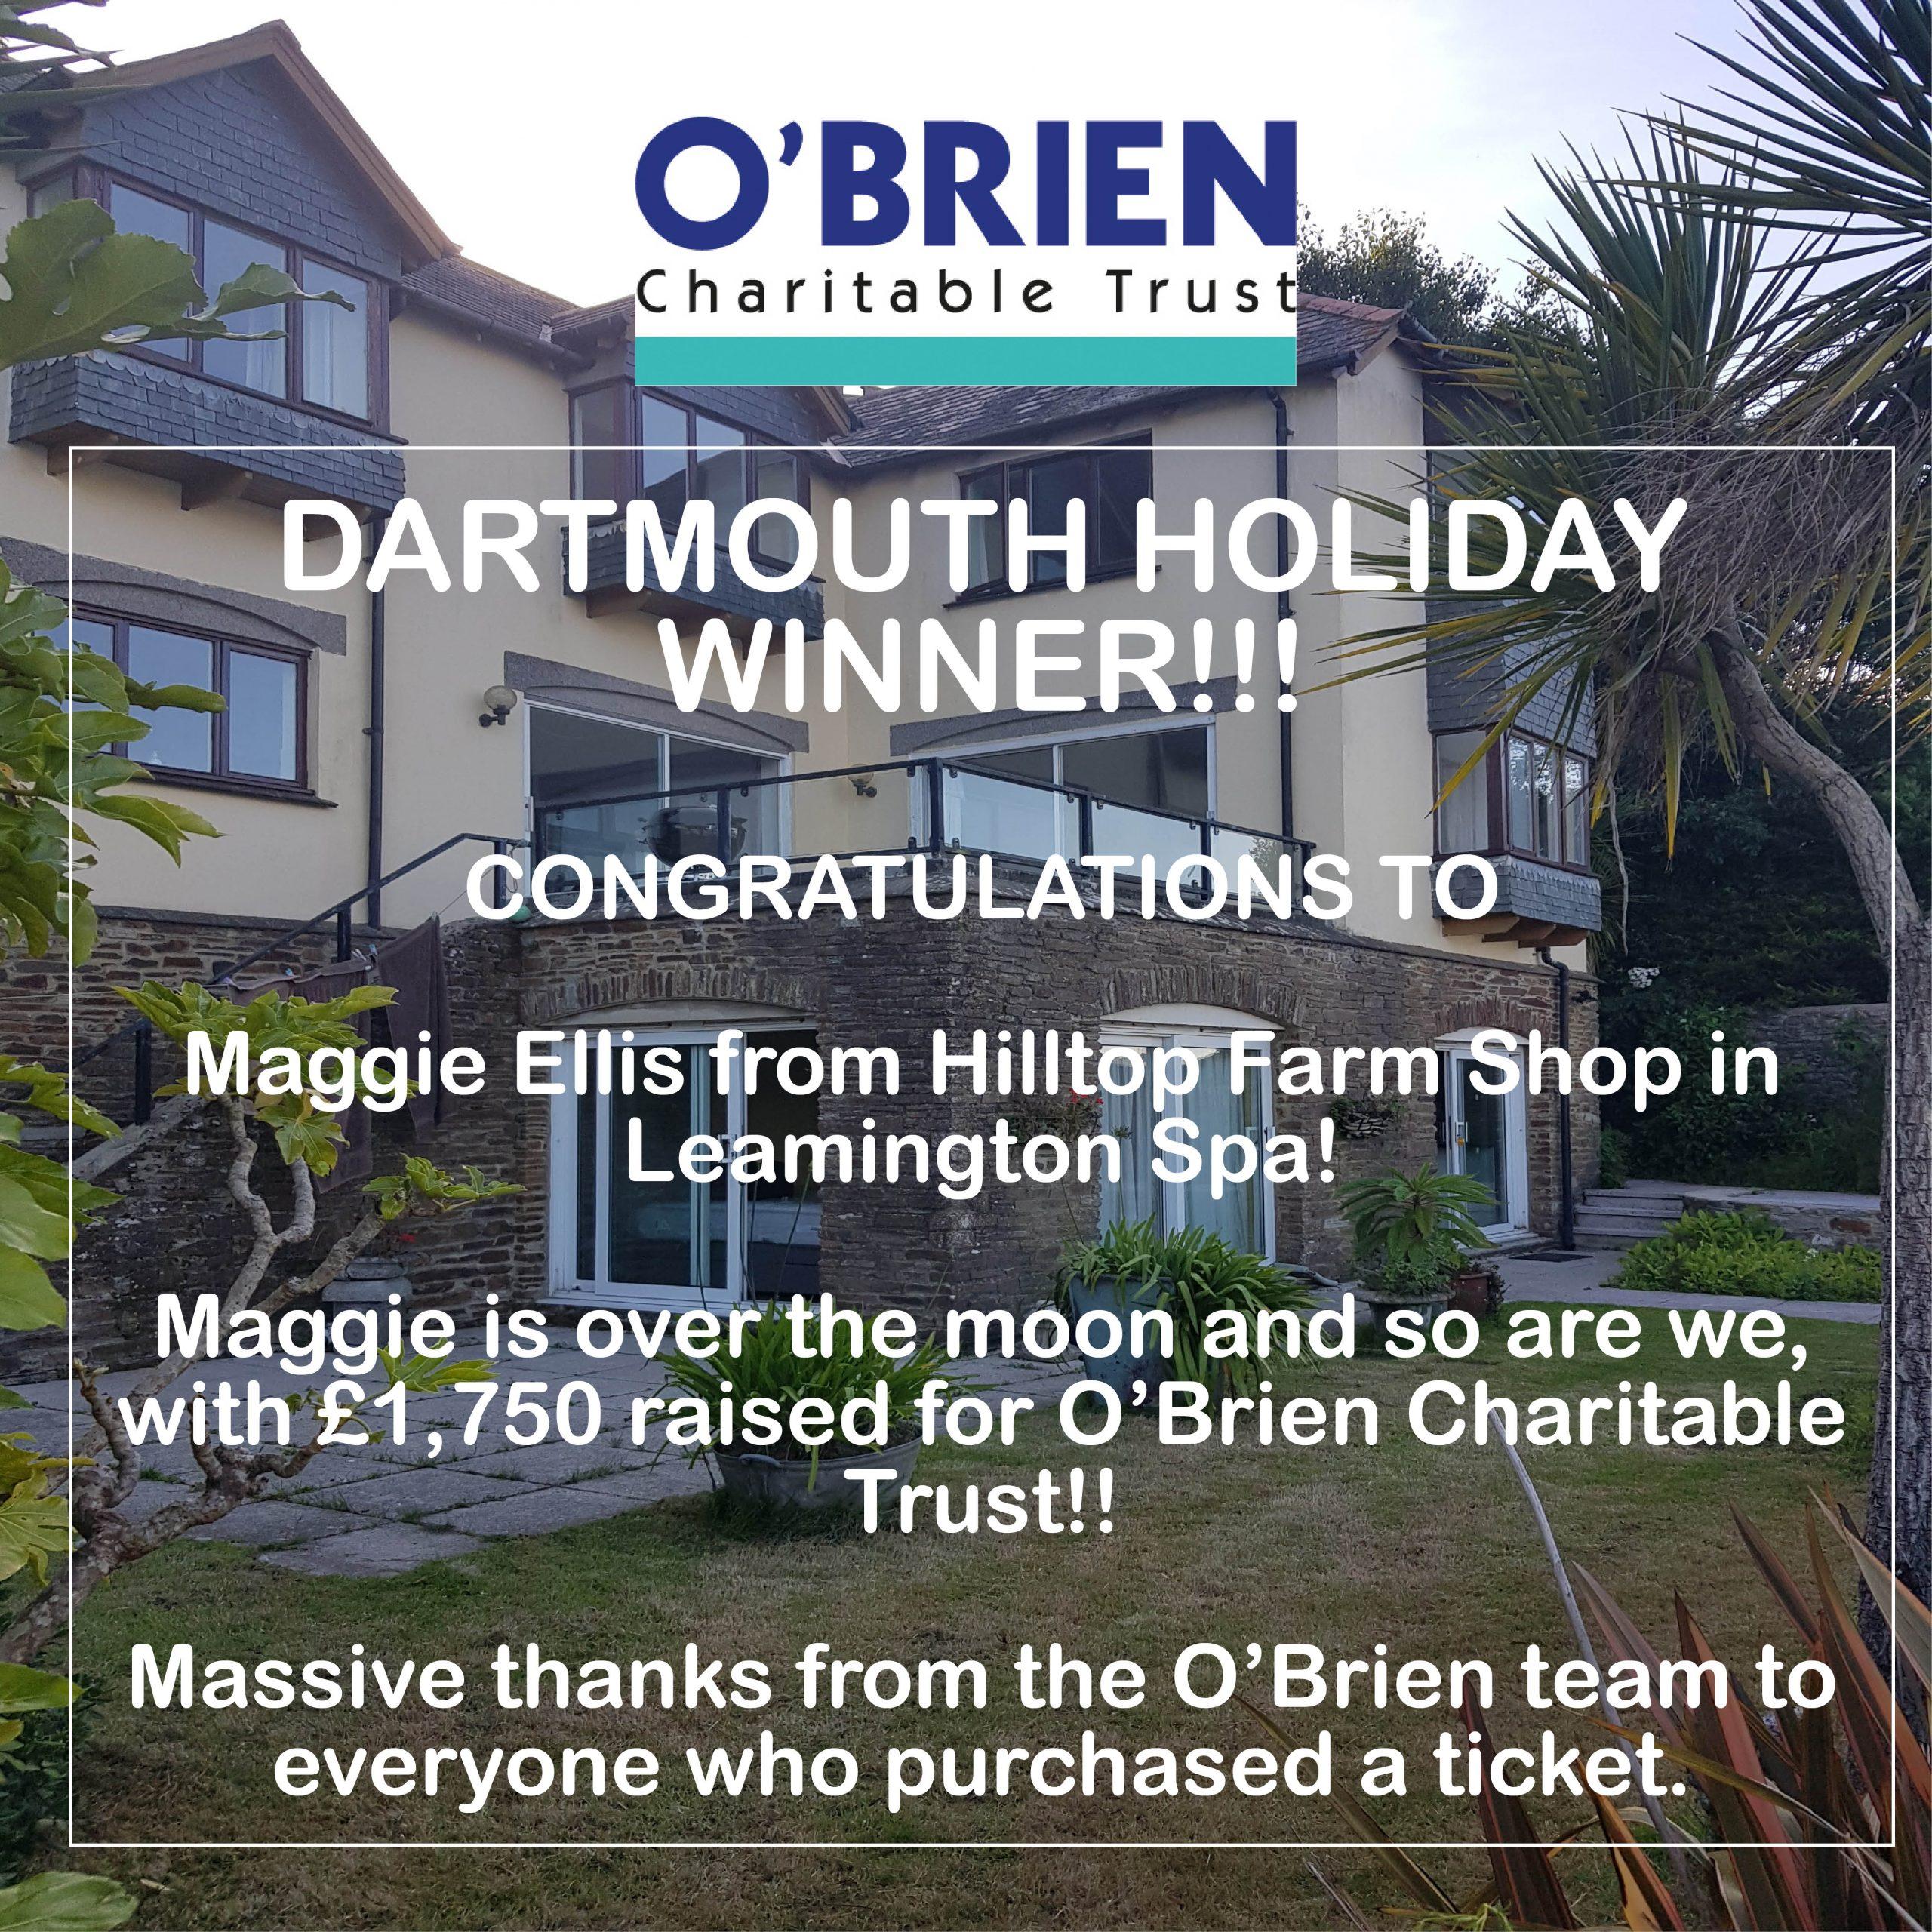 O'Brien Charitable Trust Dartmouth Holiday Raffle Result!